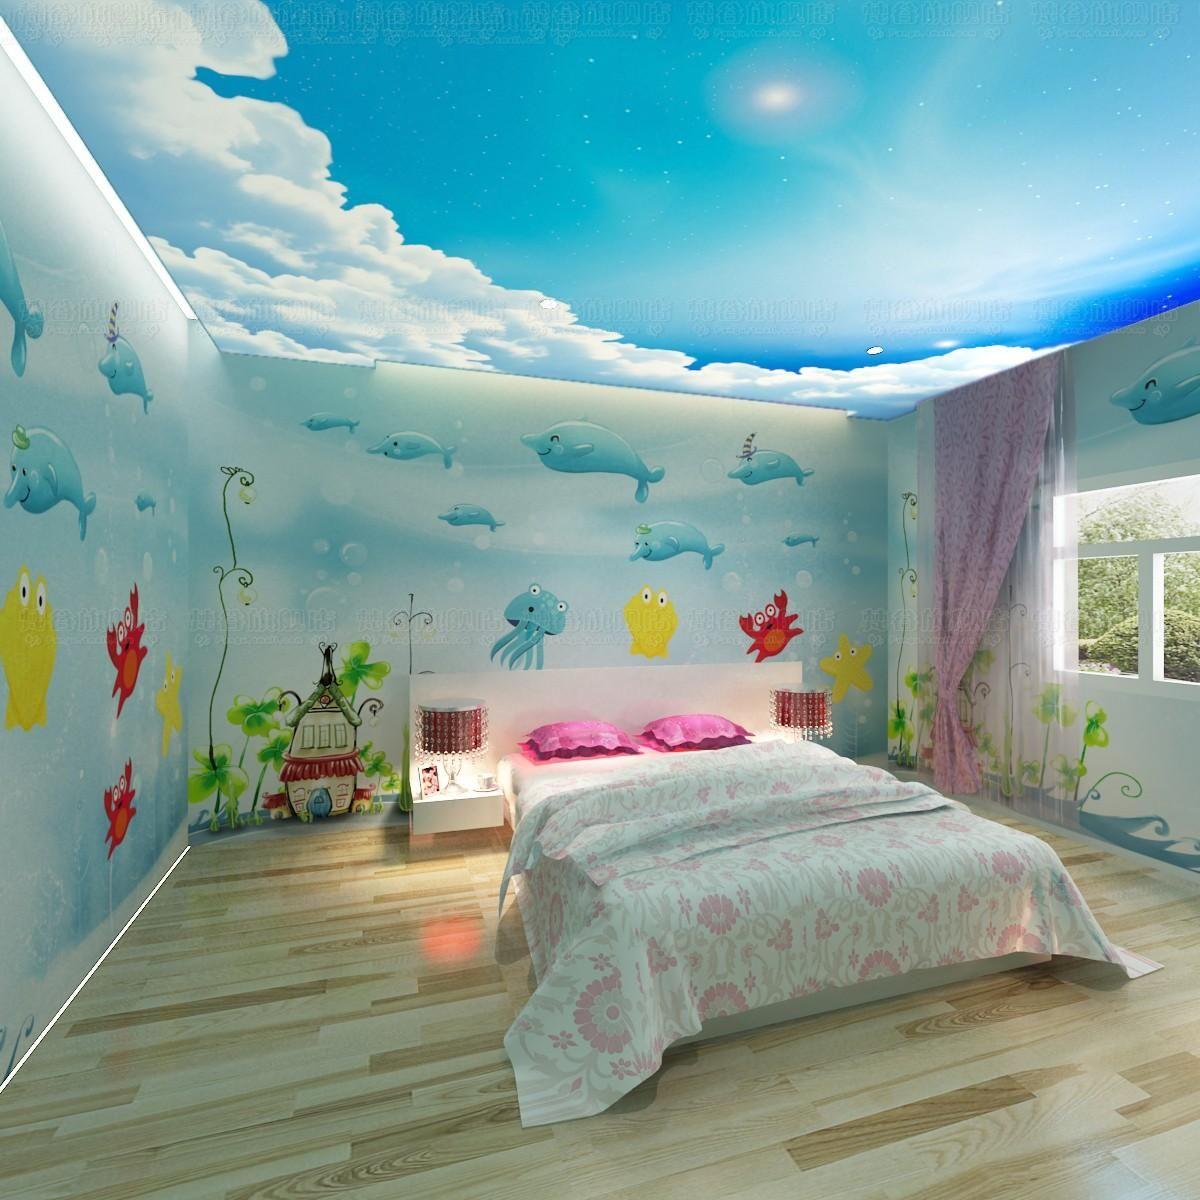 Modern wall murals modern wall coverings - Free Shipping 3d Wallpaper Dolphin Cartoon Child Real Background Wall Paper Bedroom Wall Mural Wallpaper Wallpaper